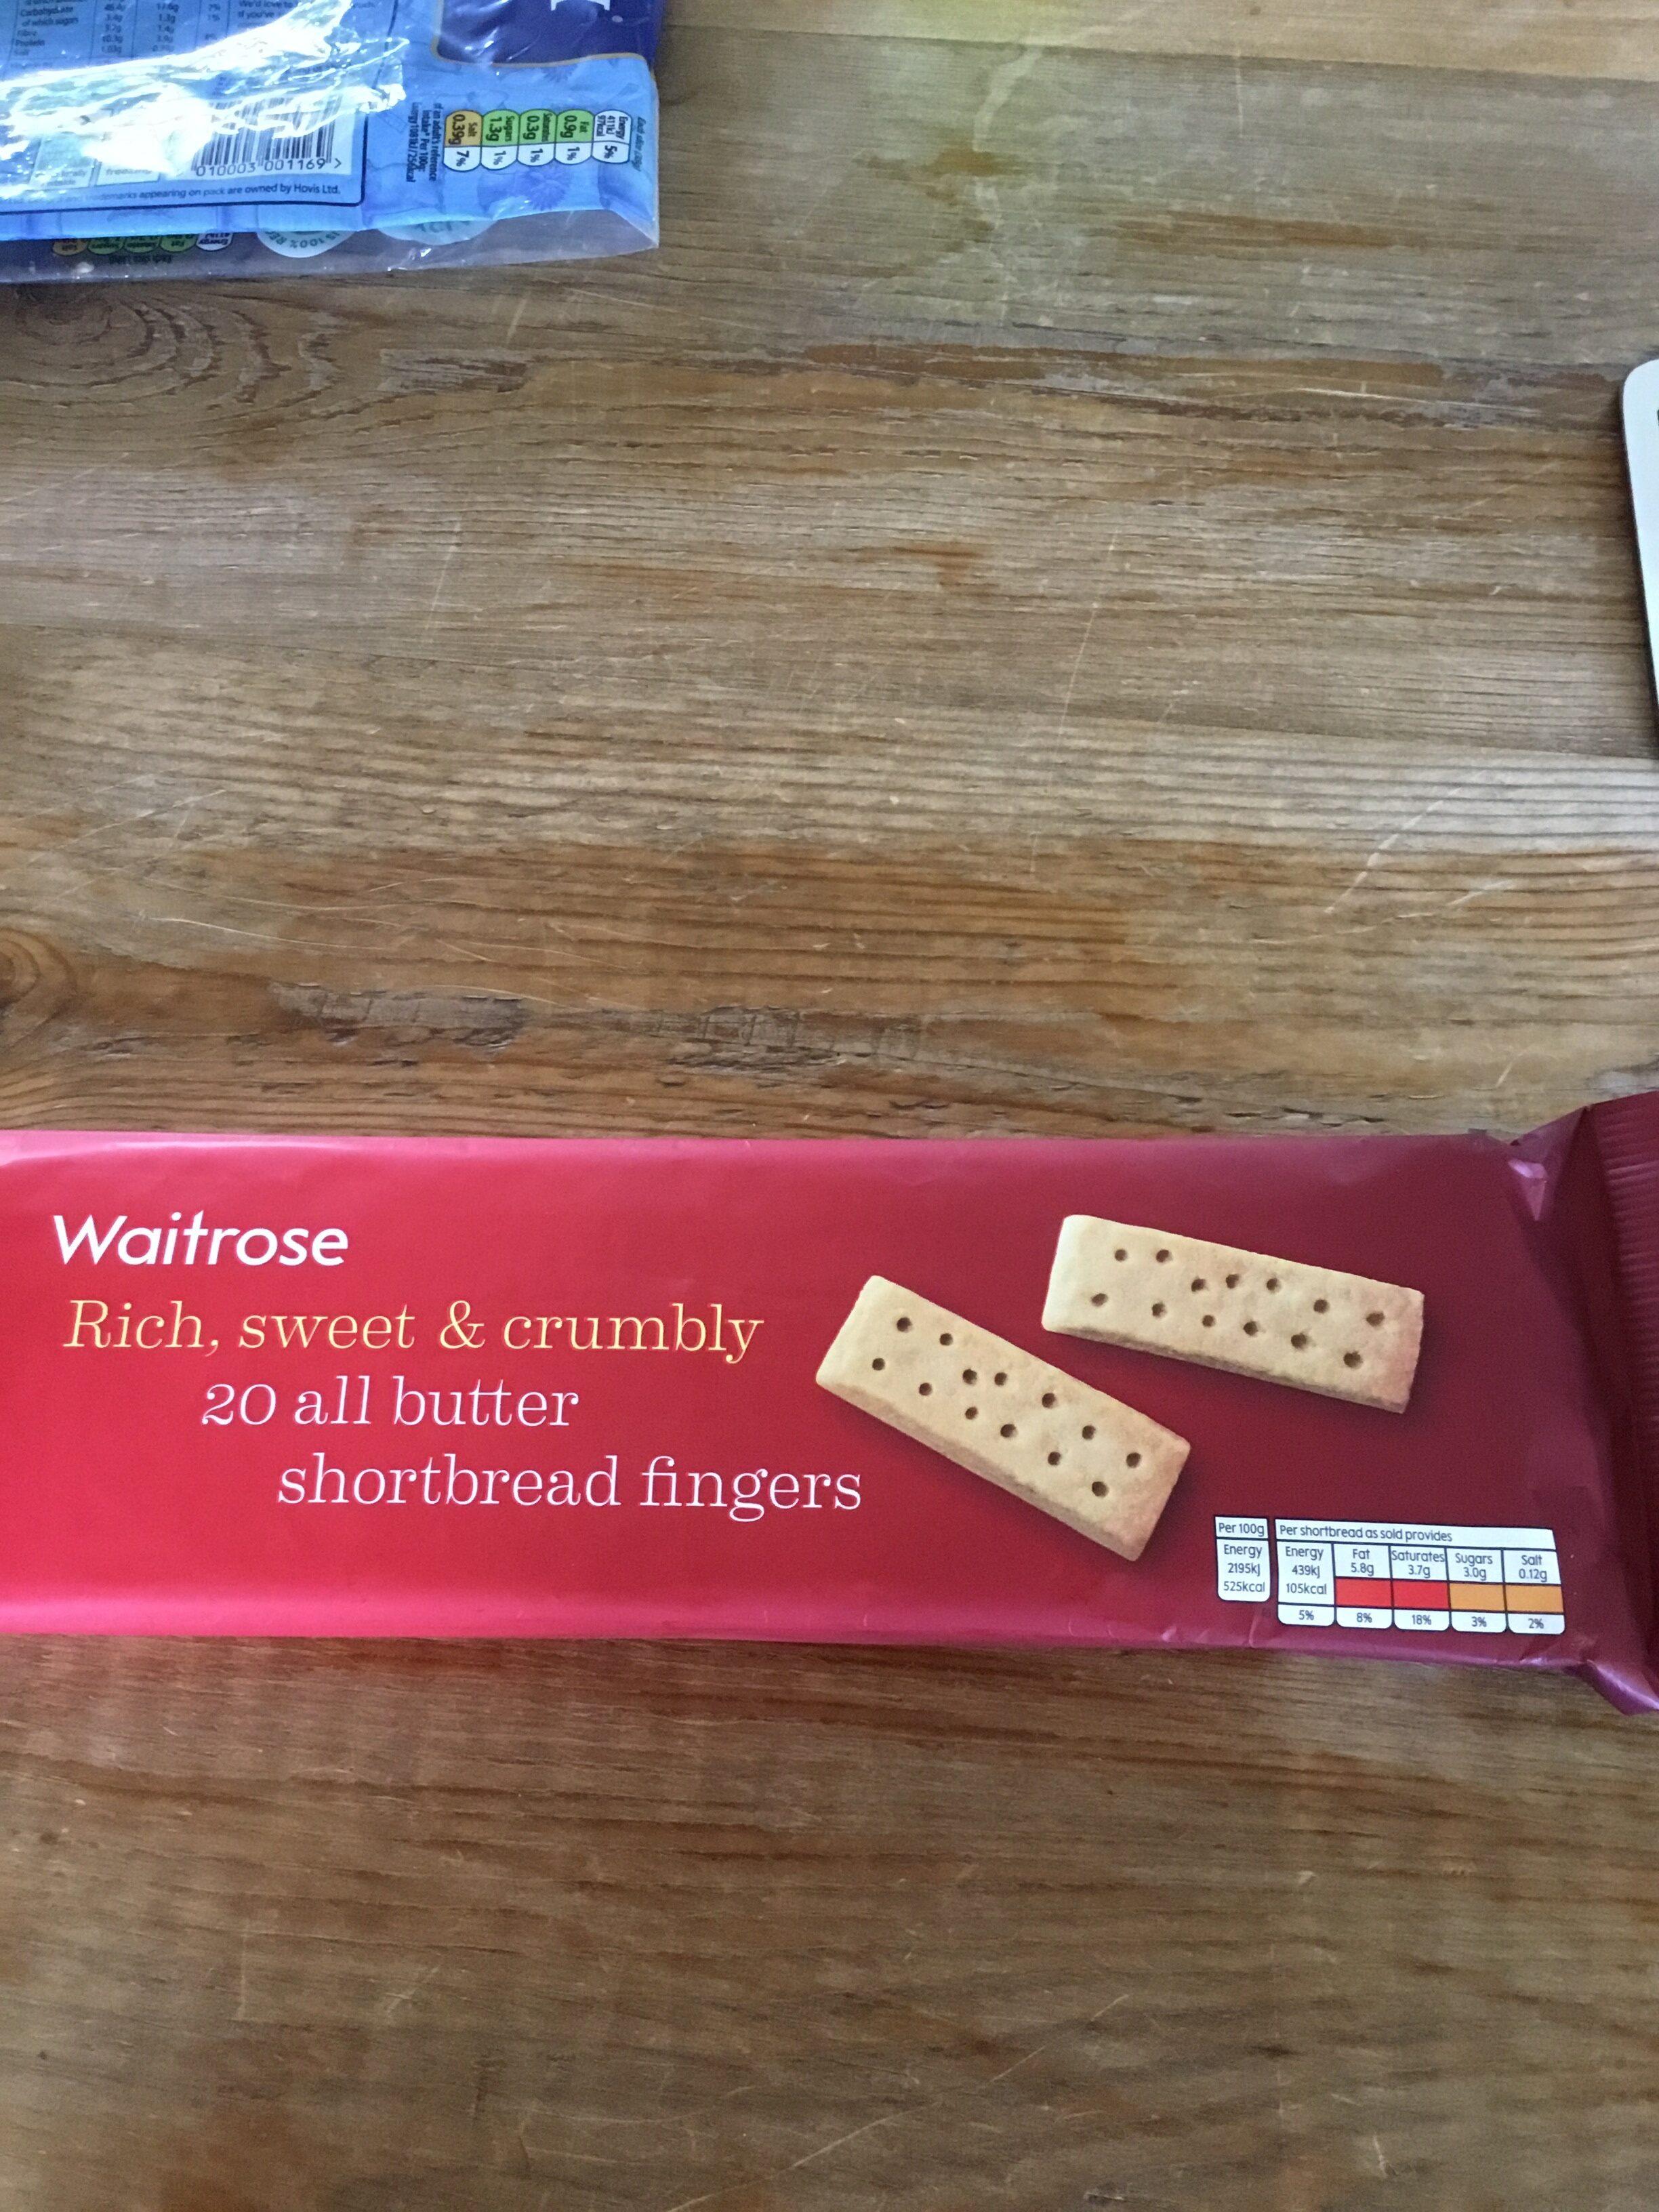 Waitrose shortbread fingers - Product - en